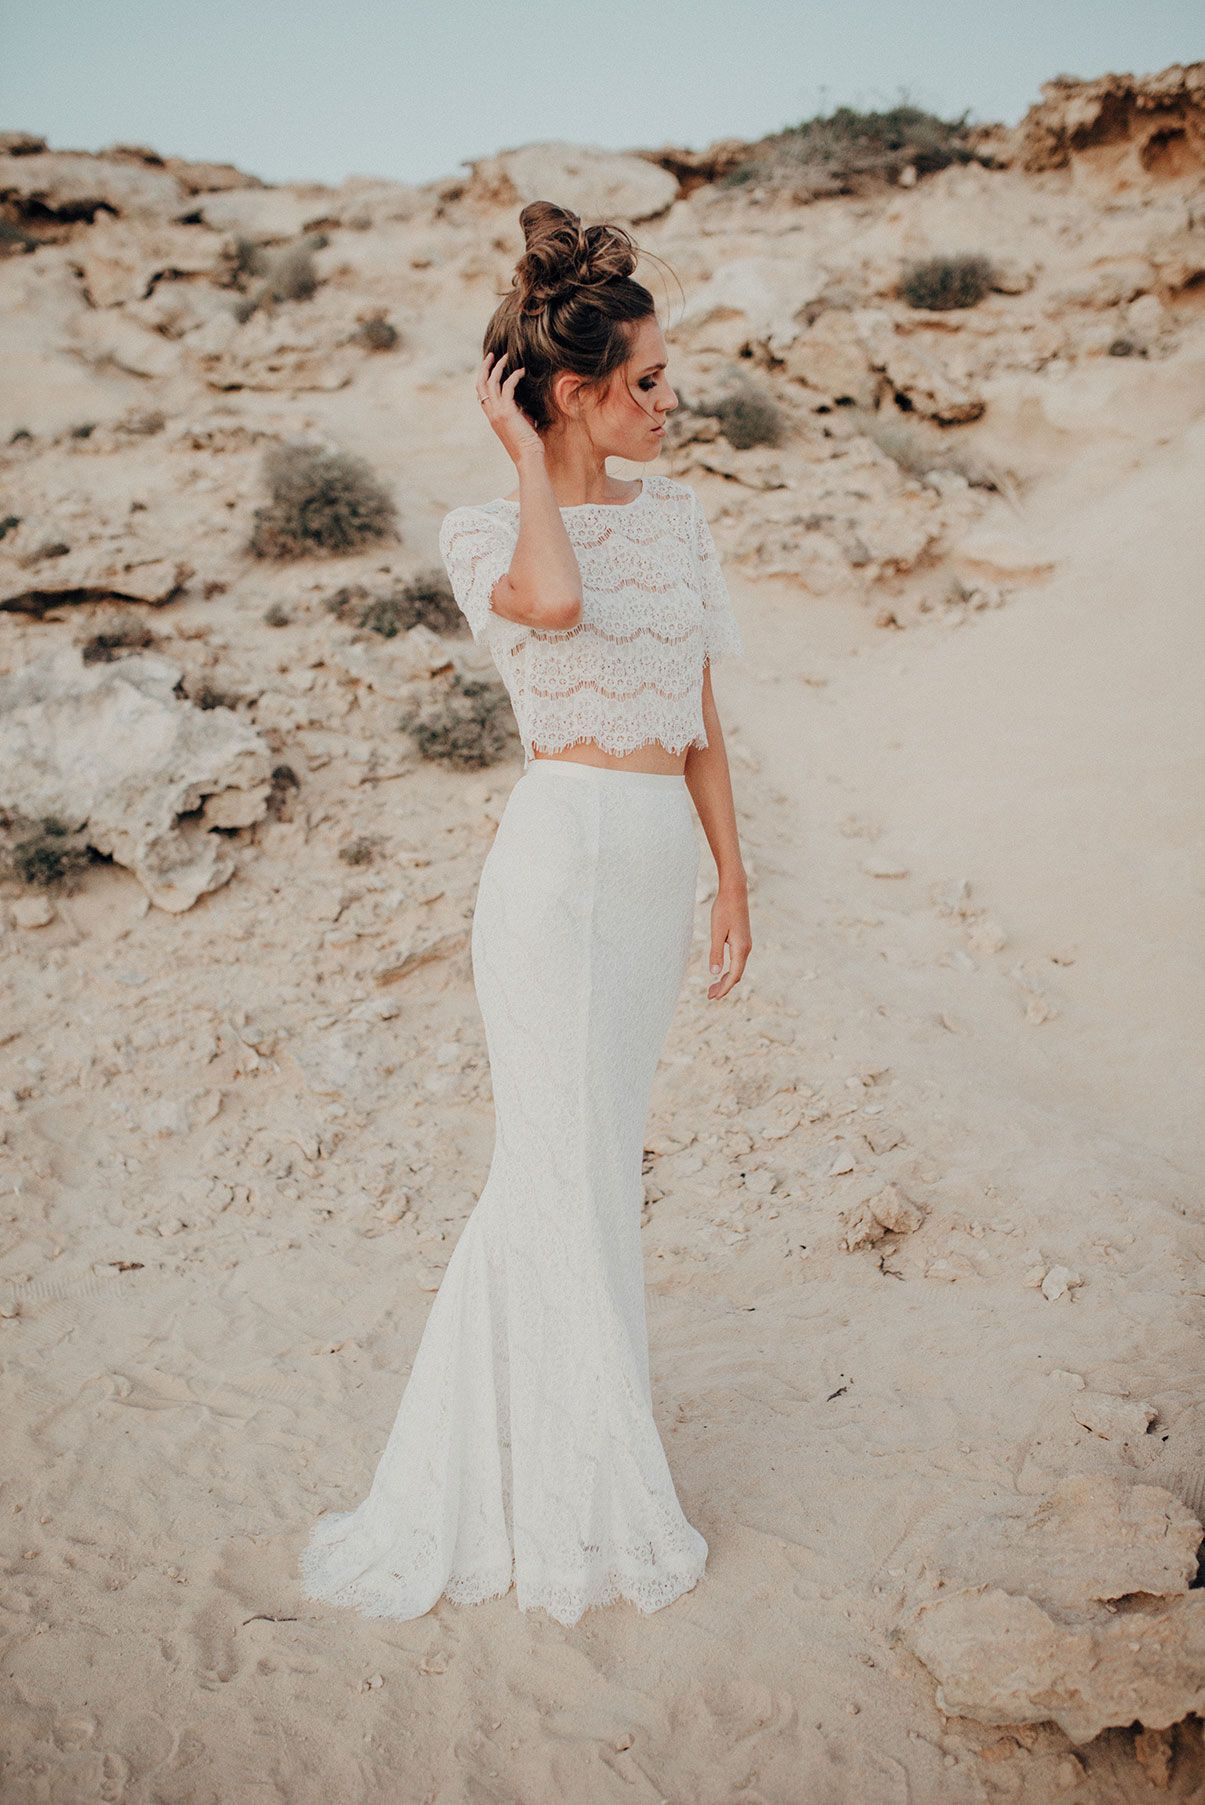 Bridal separates wedding separates two piece beach wedding dress